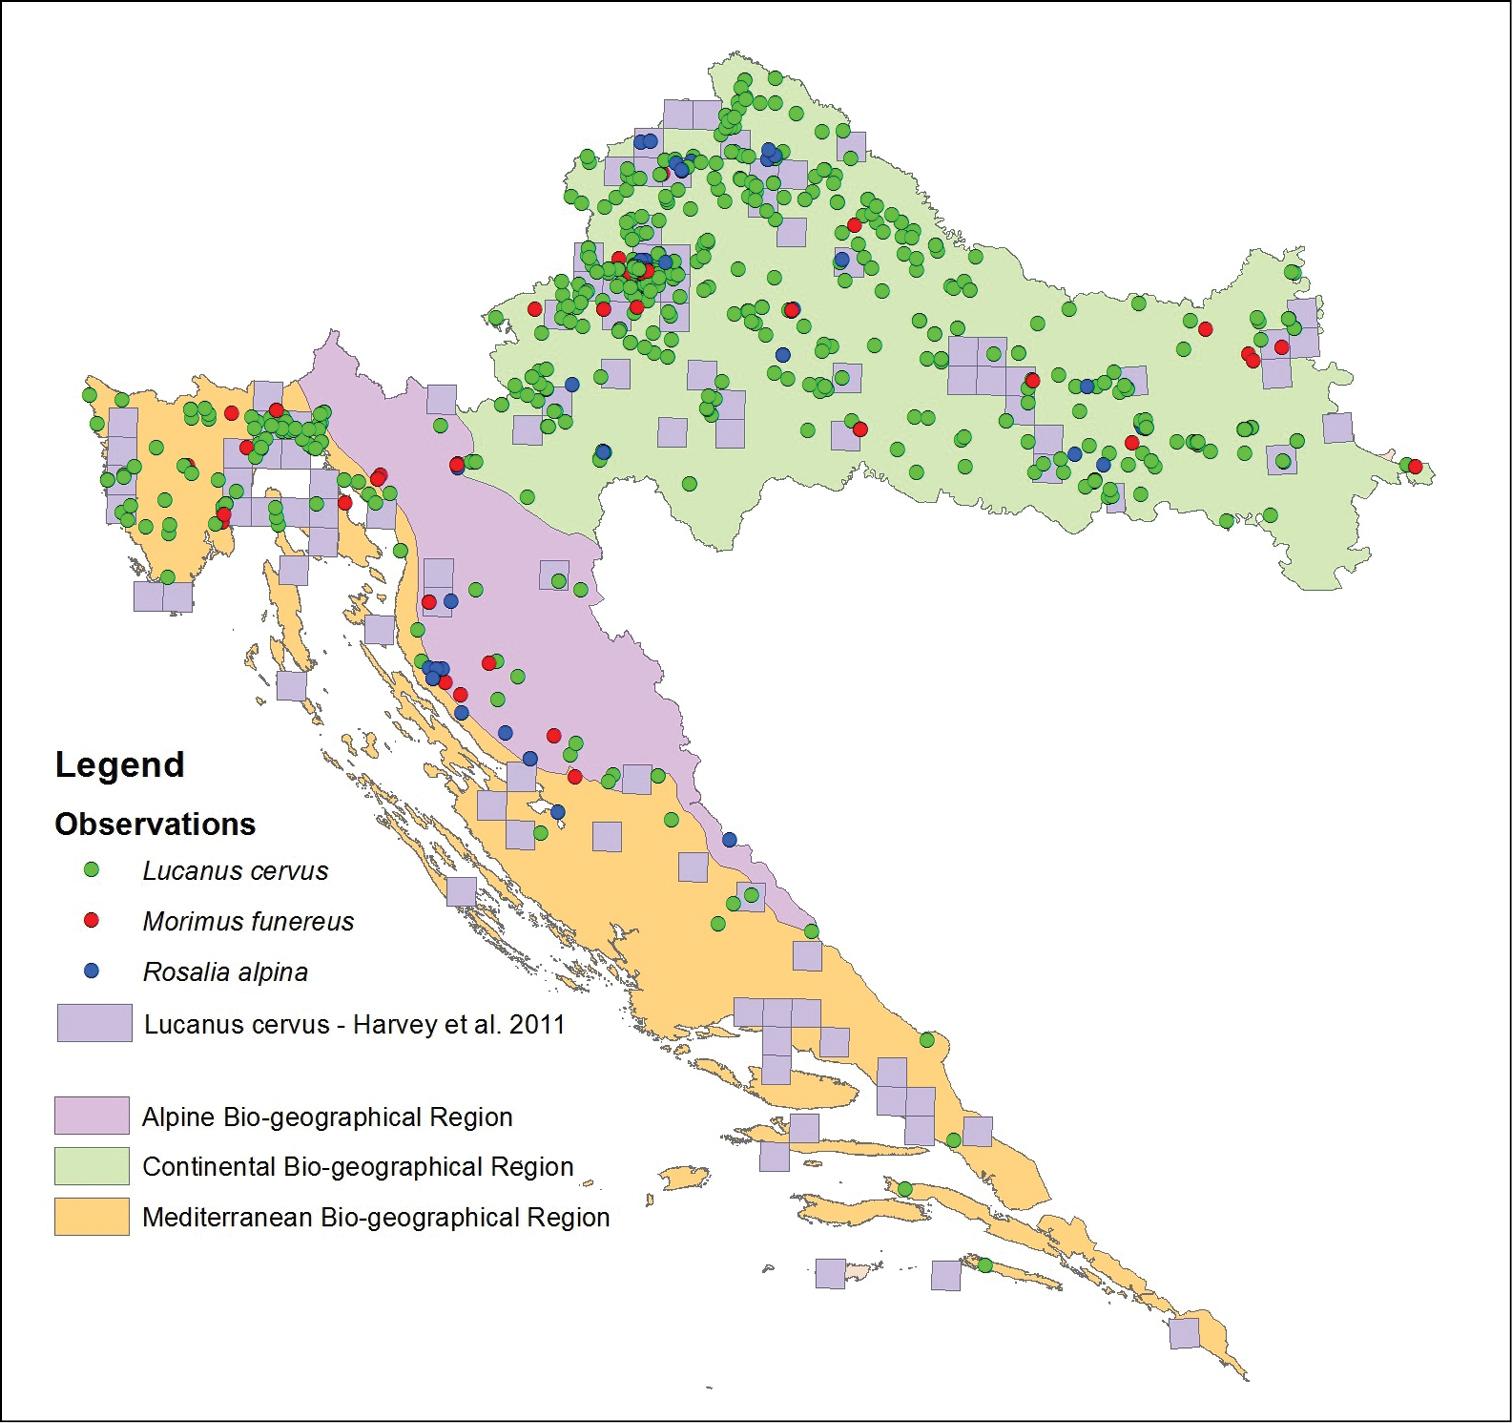 Monitoring of saproxylic beetles in Croatia: following the